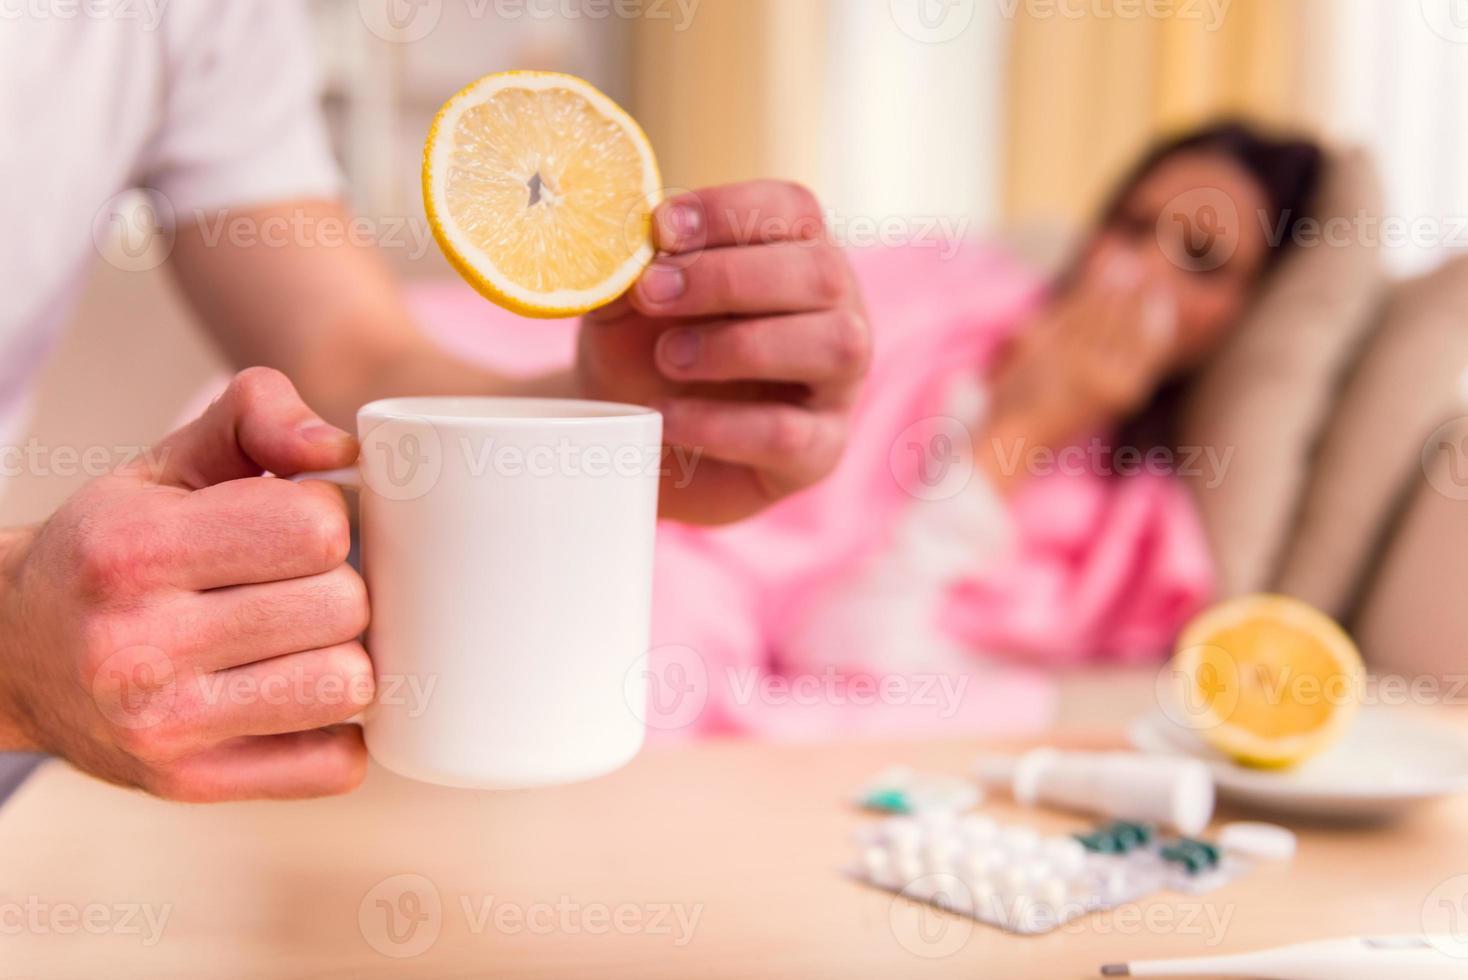 junge Krankheit Frau foto